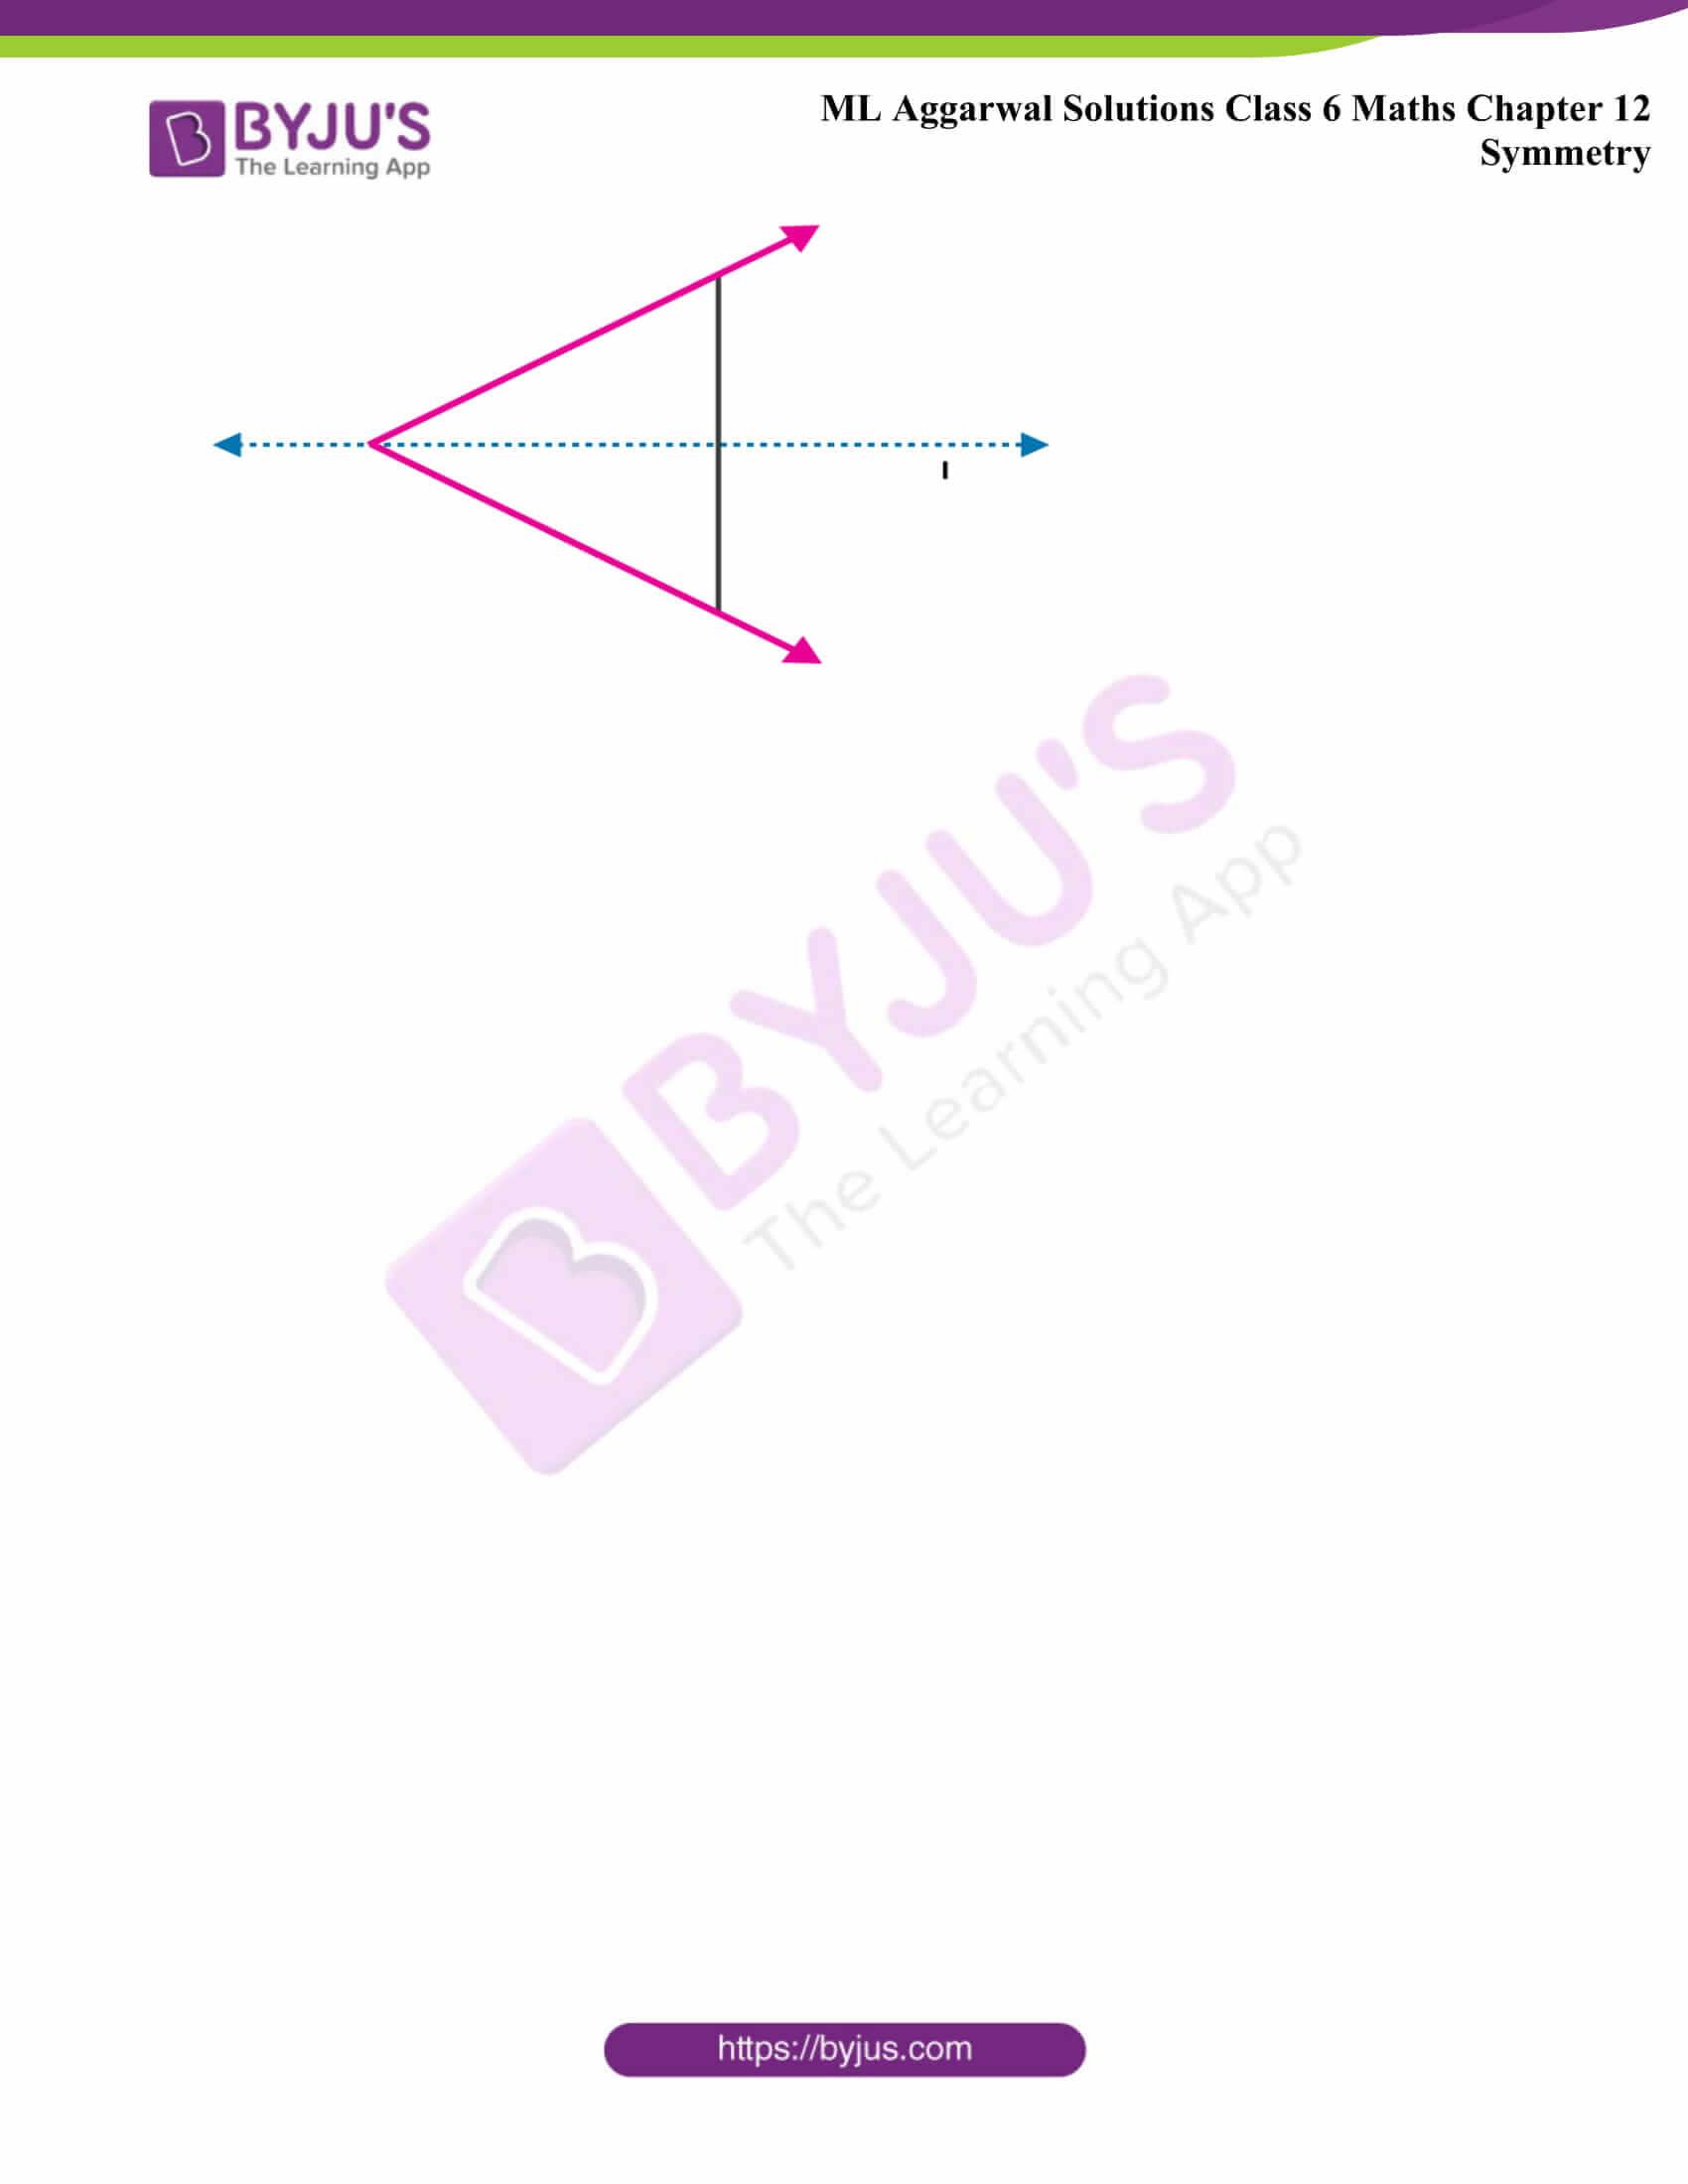 ml aggarwal sol class 6 maths chapter 12 5